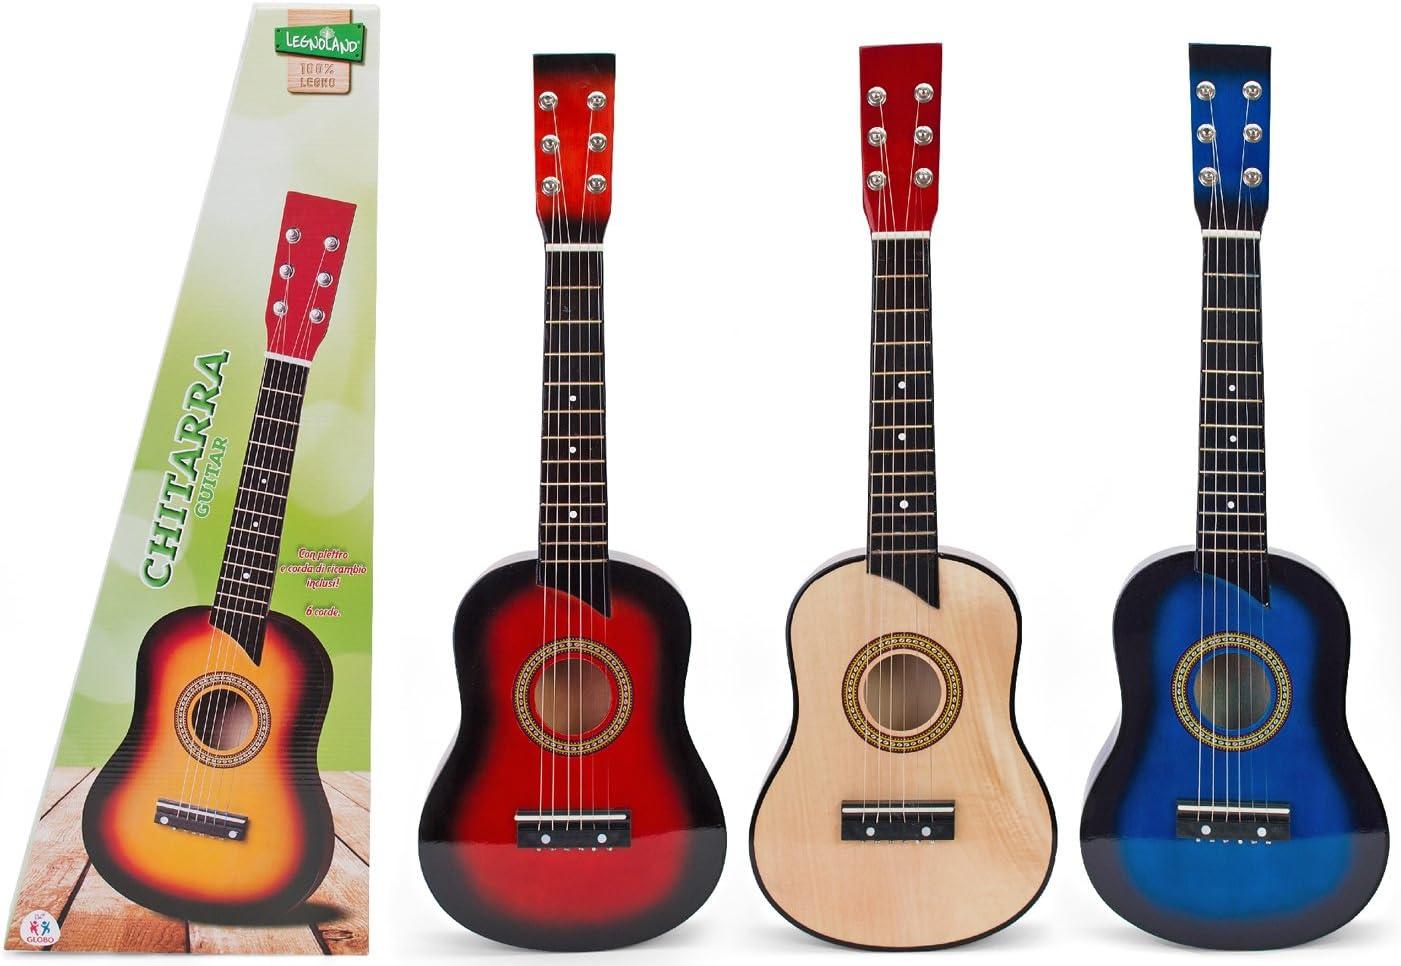 Globo Juguetes Globo – 36054 63 cm Legnoland Guitarra de Madera ...